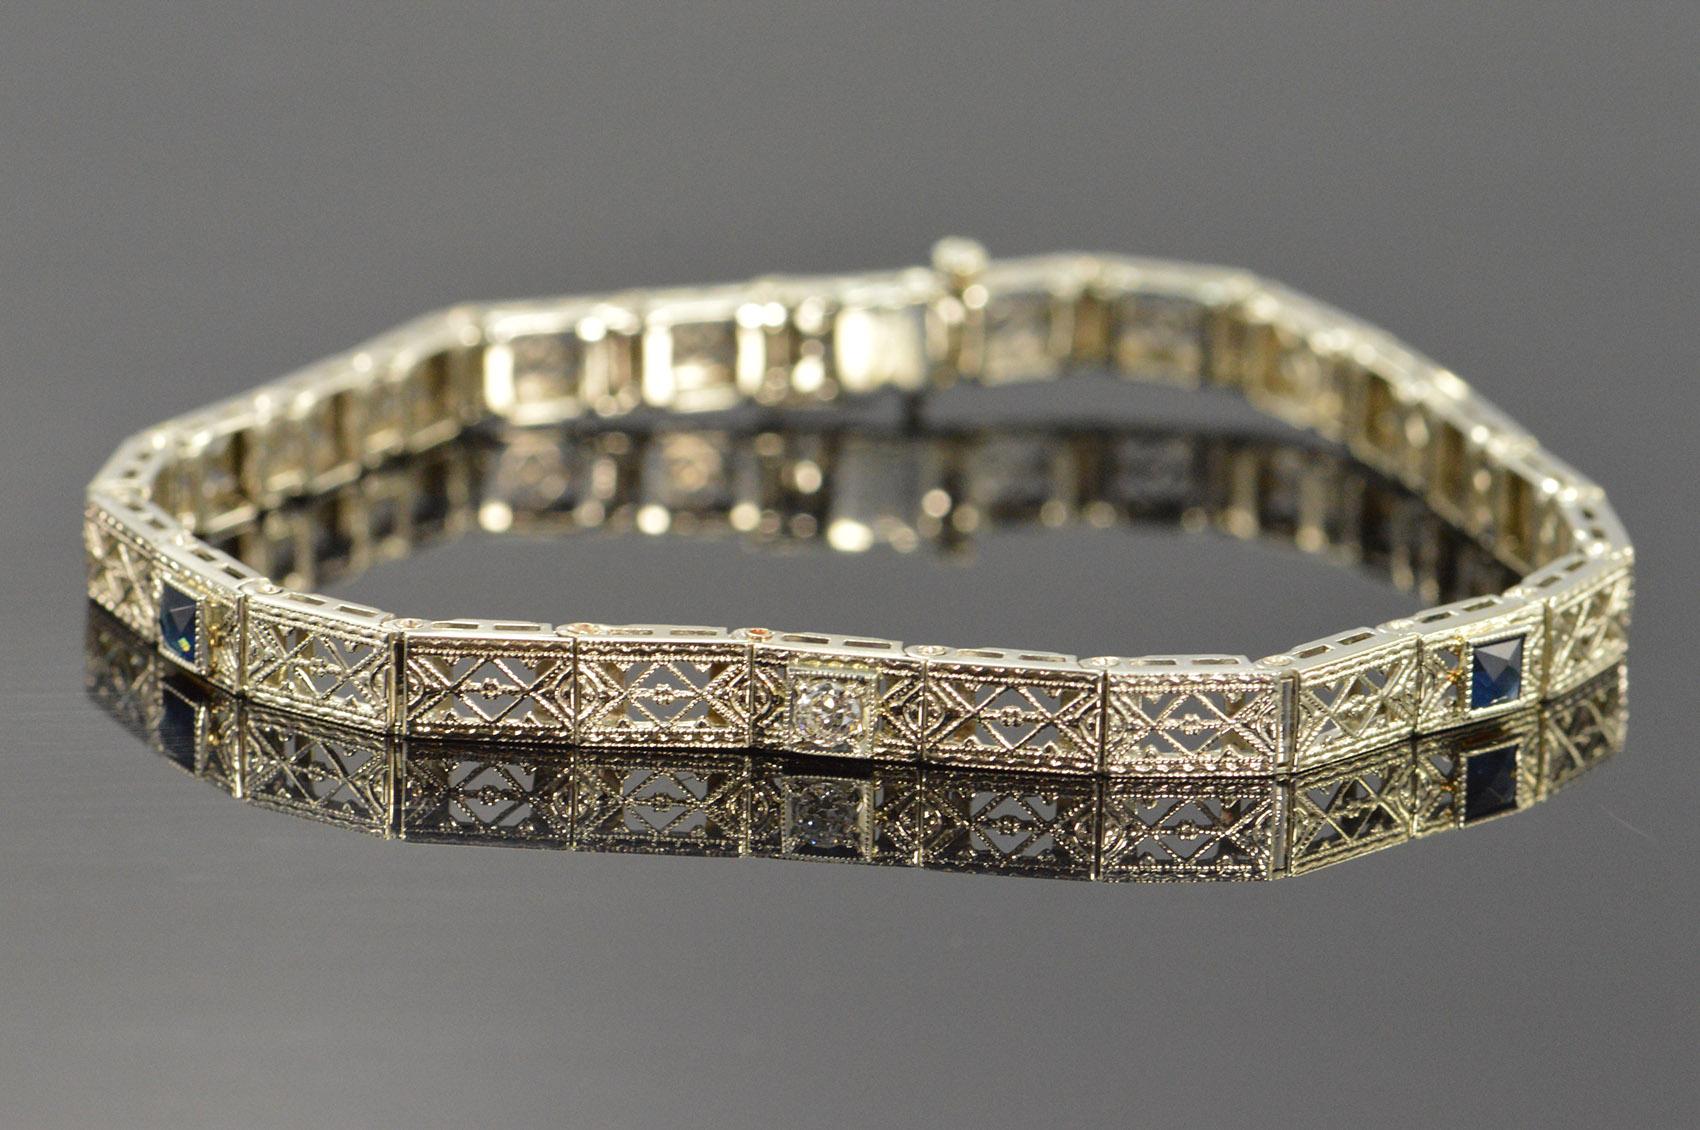 14k 7 5g Antique 0 46 Ctw Filigree Mine Cut Diamond Shire White Gold Bracelet 5